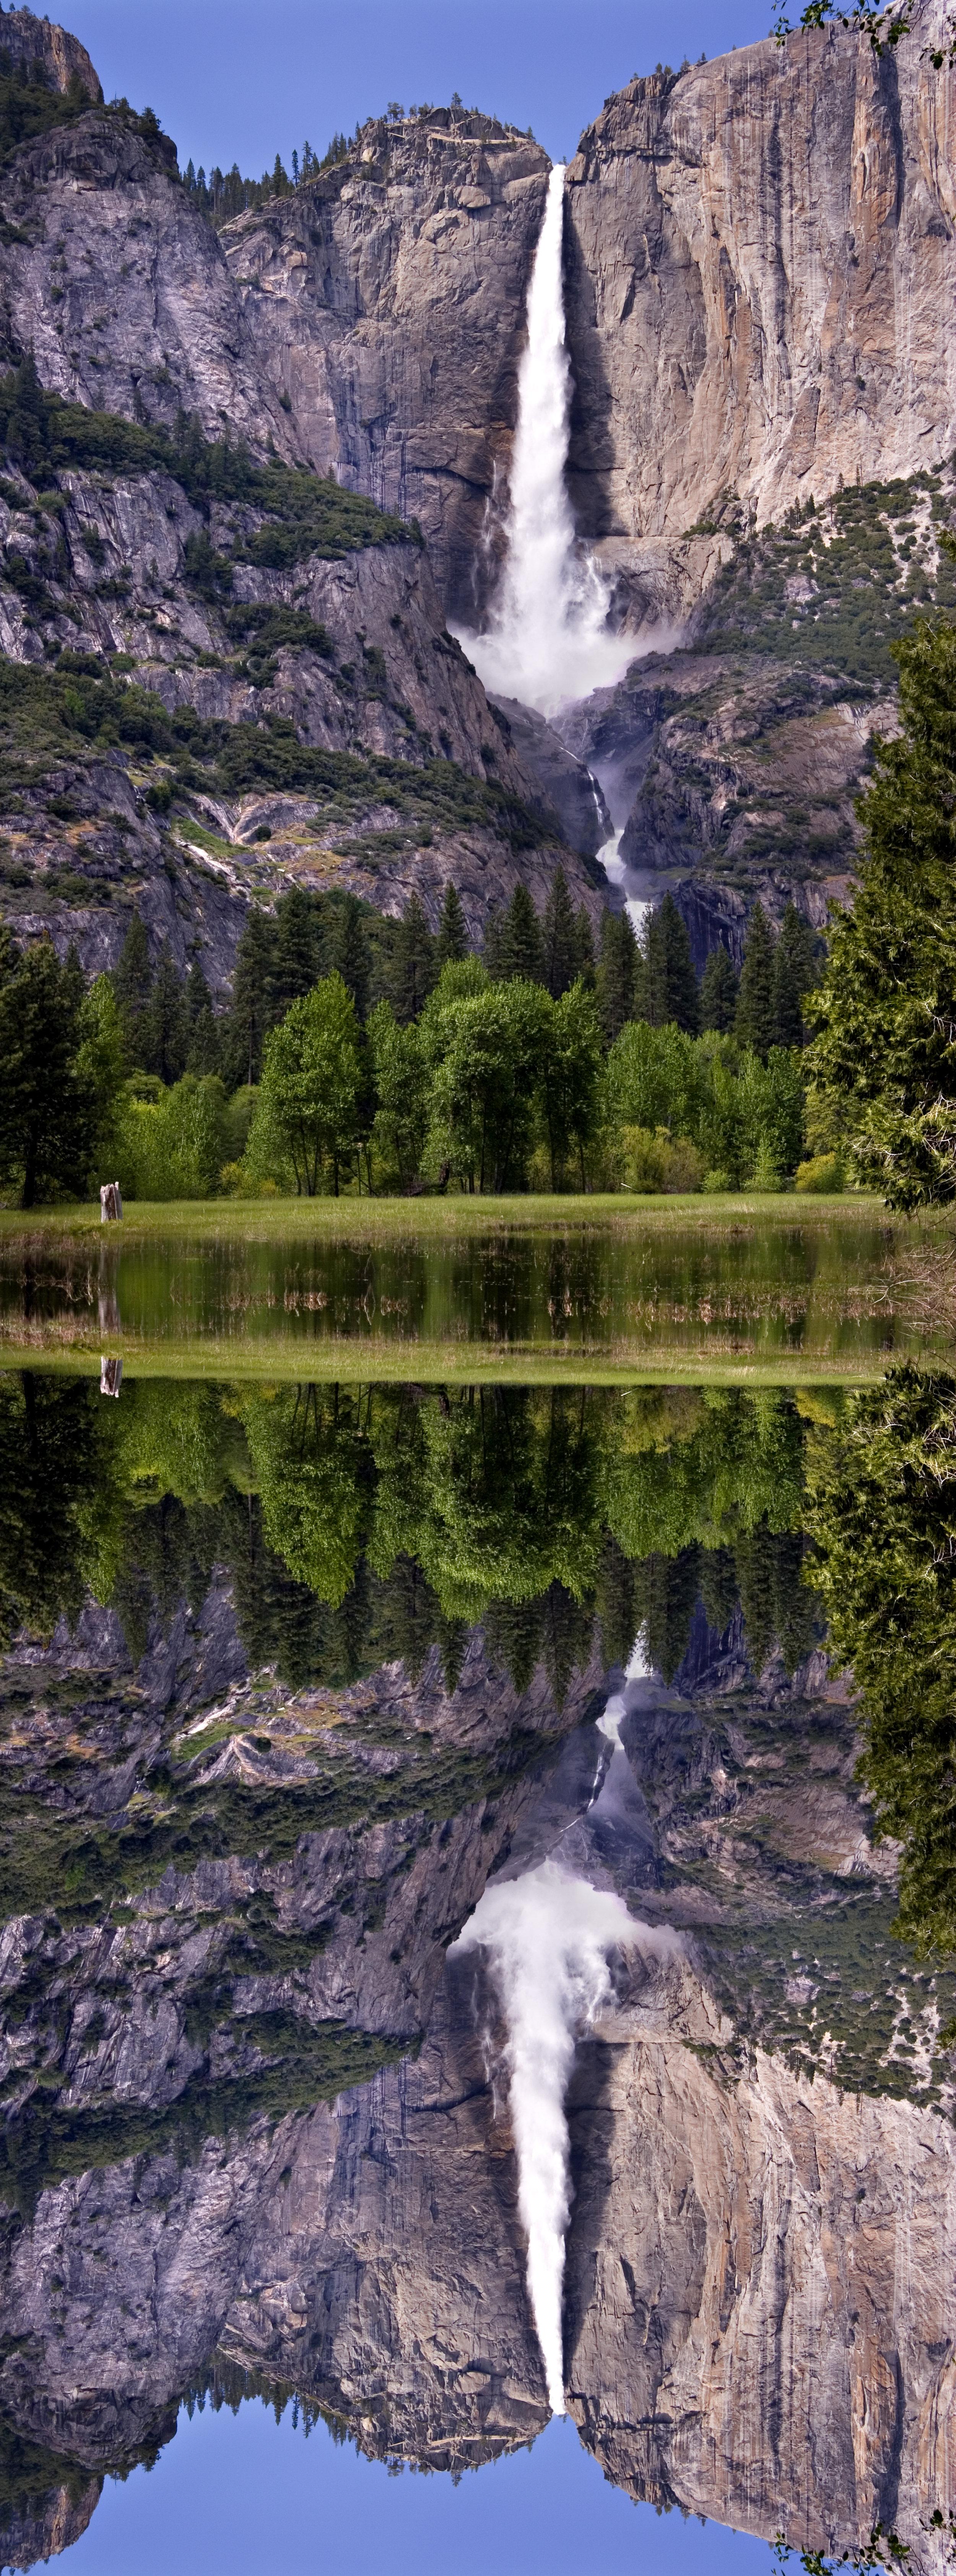 YosemitefallsB&Wmirror.jpg